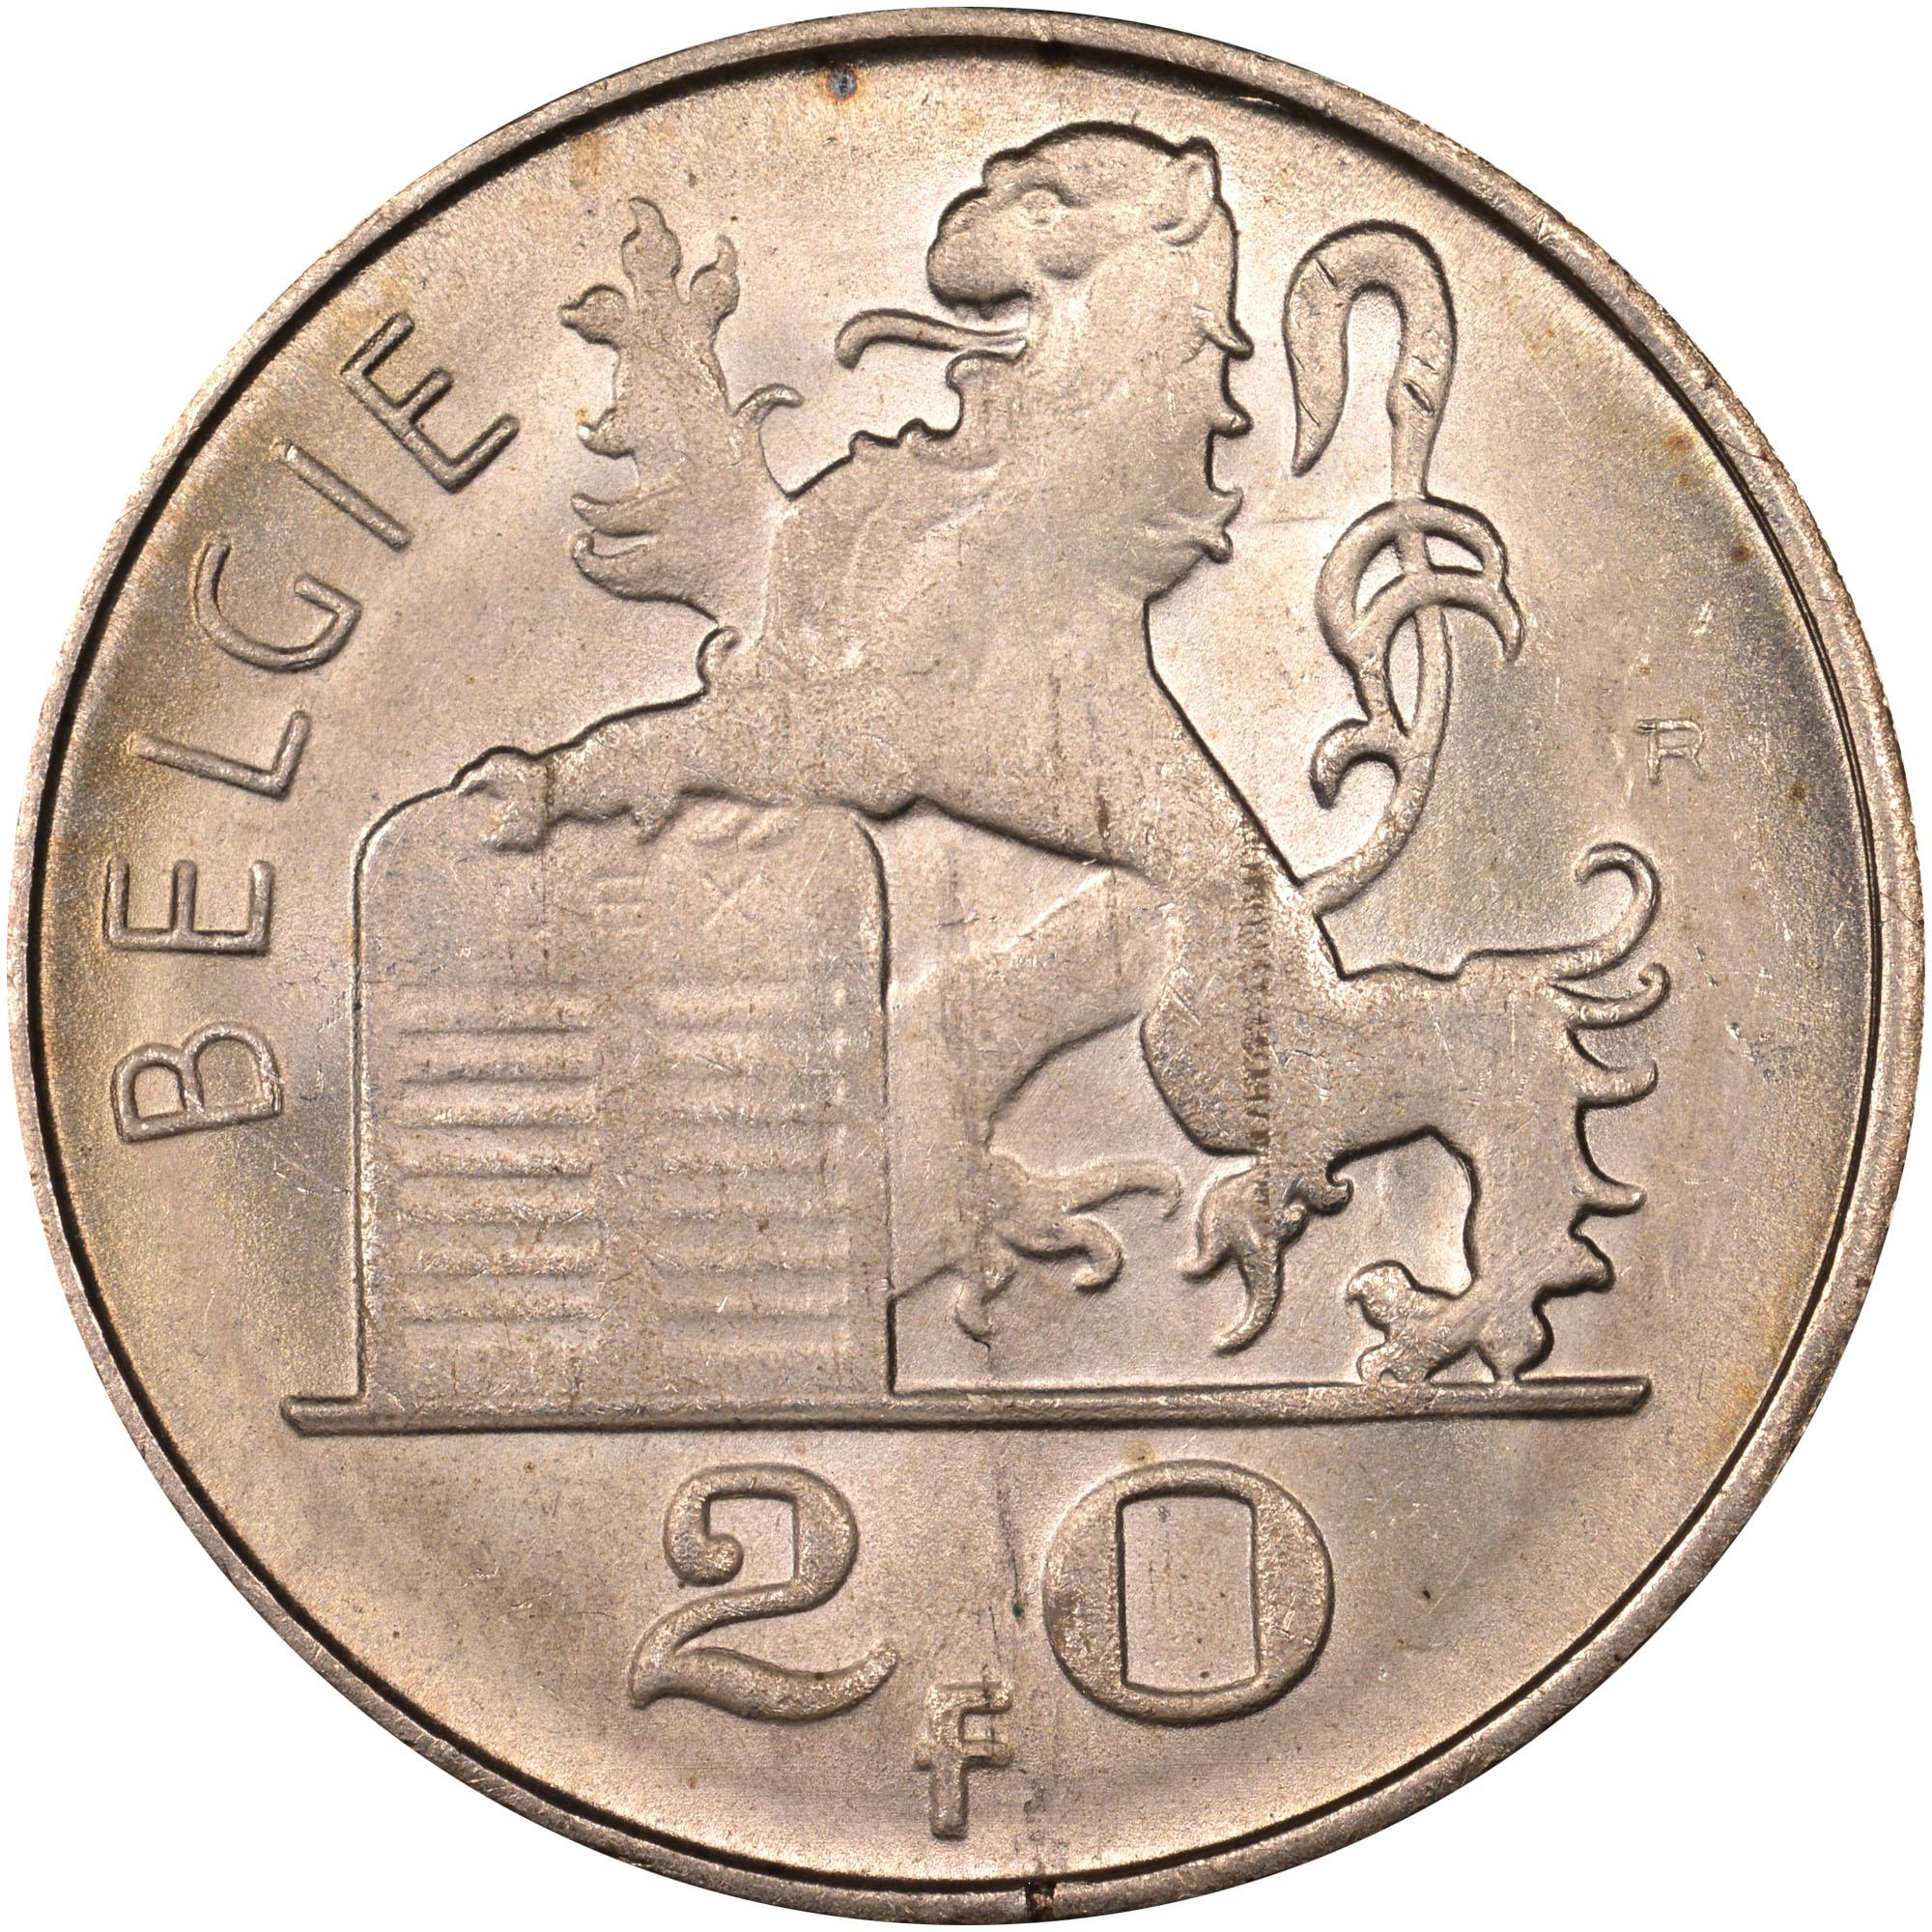 Belgium 20 Francs obverse